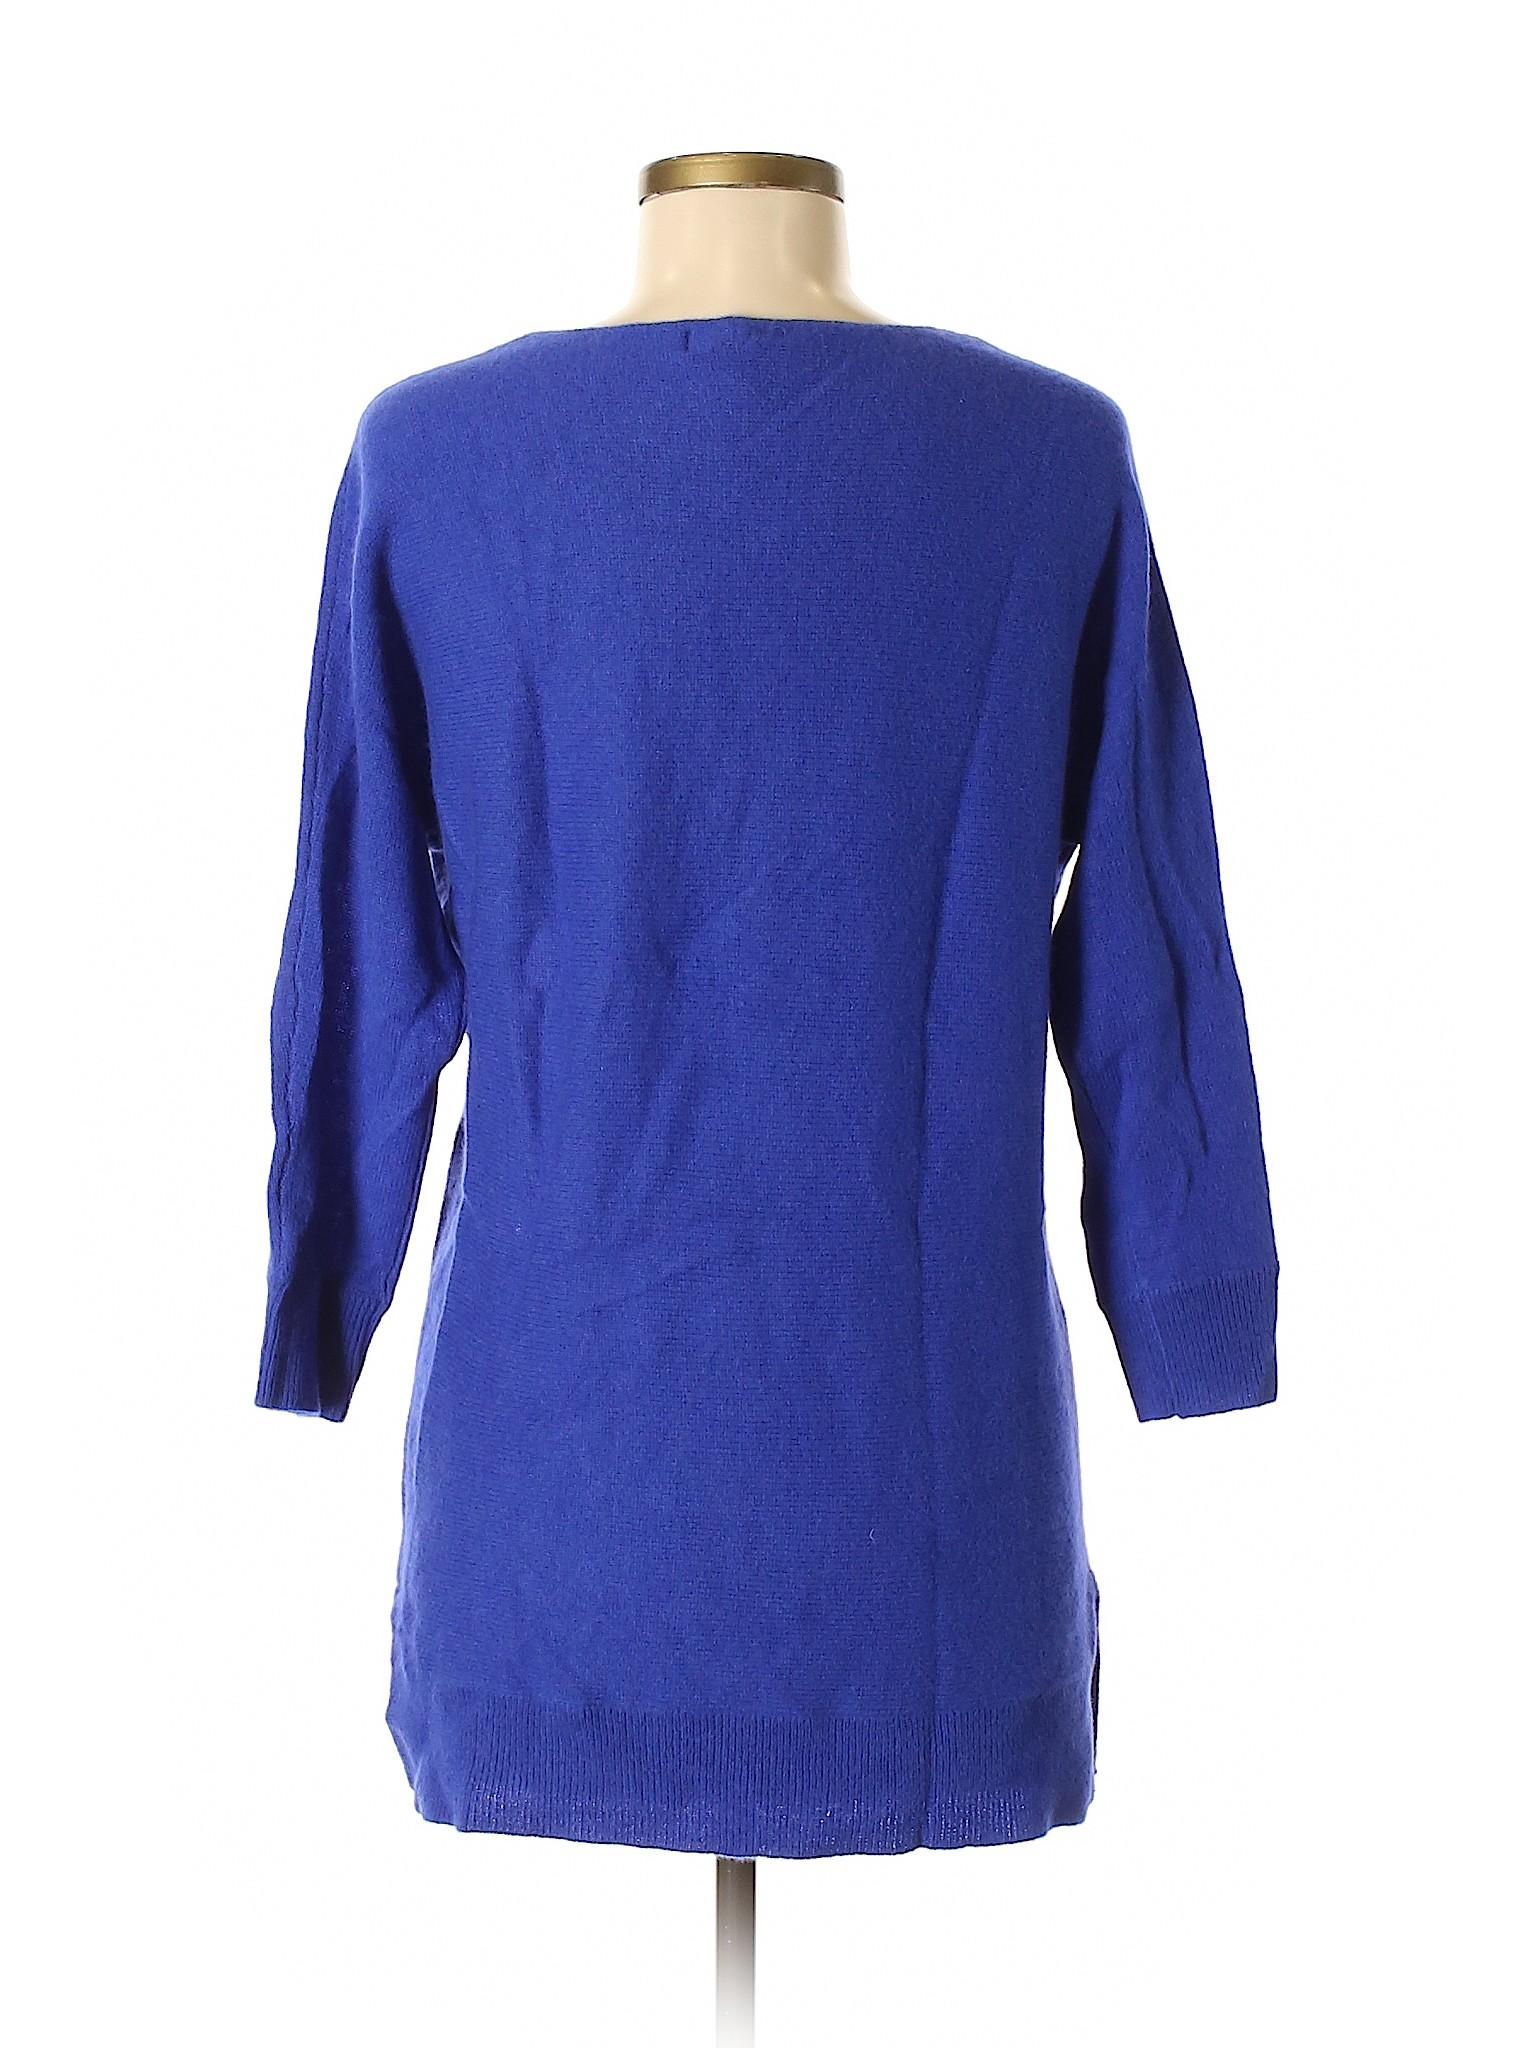 Sweater Willi Smith Boutique Pullover Cashmere winter wXTqxqR